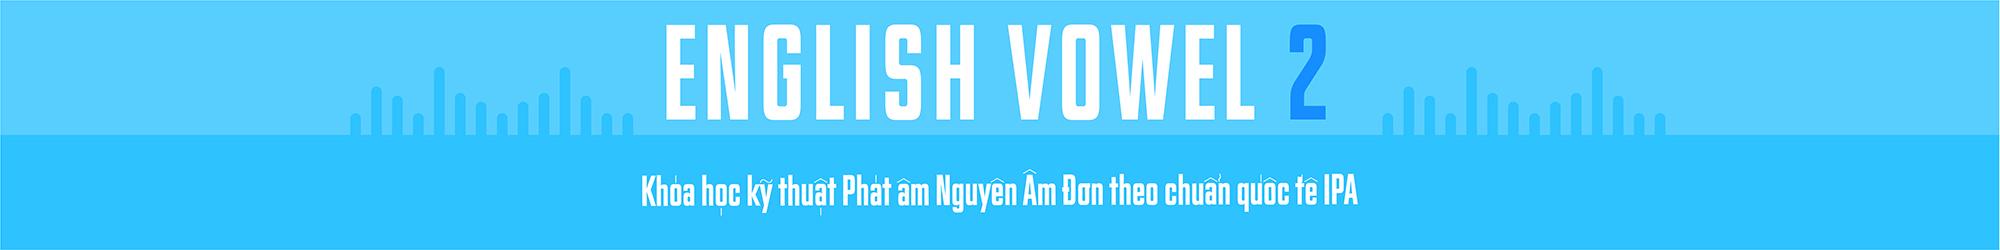 English Pronunciation IPA (Vowels 2) banner